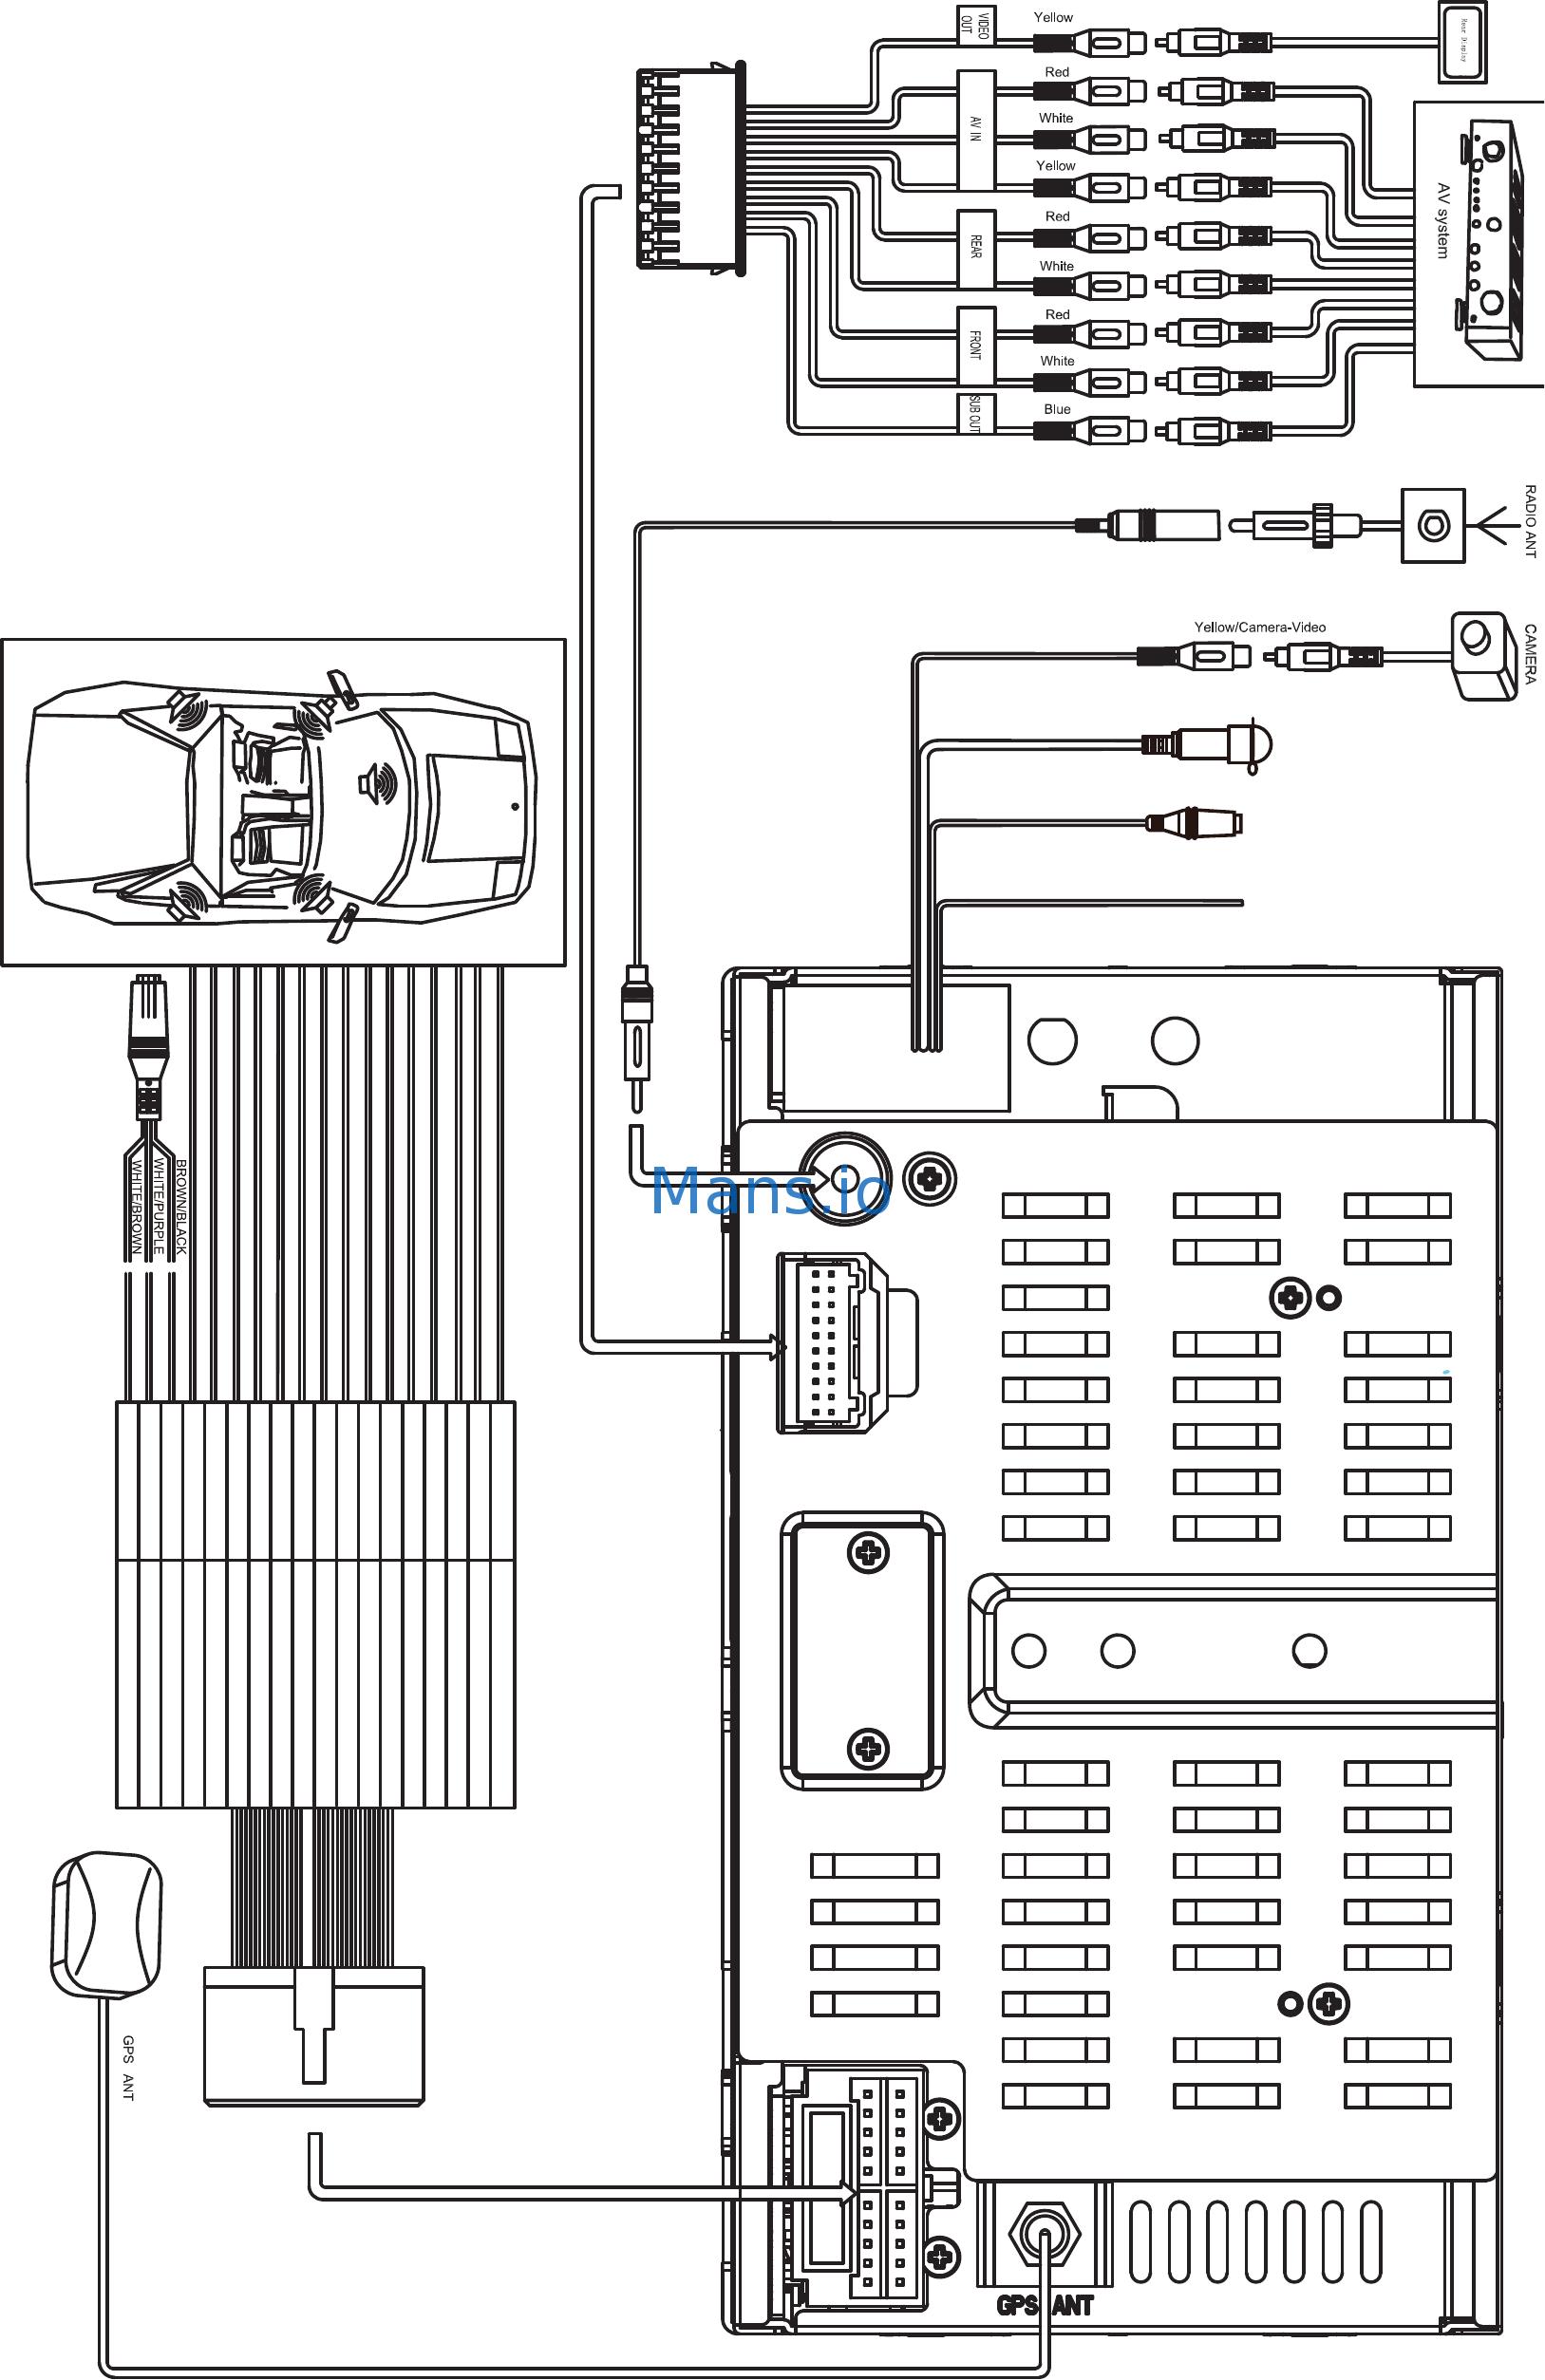 DIAGRAM] Jensen Vm9214 Wiring Diagram FULL Version HD Quality Wiring Diagram  - MEDIAGRAME.EMMAUS-HOTEL.ITDiagram Database - emmaus-hotel.it